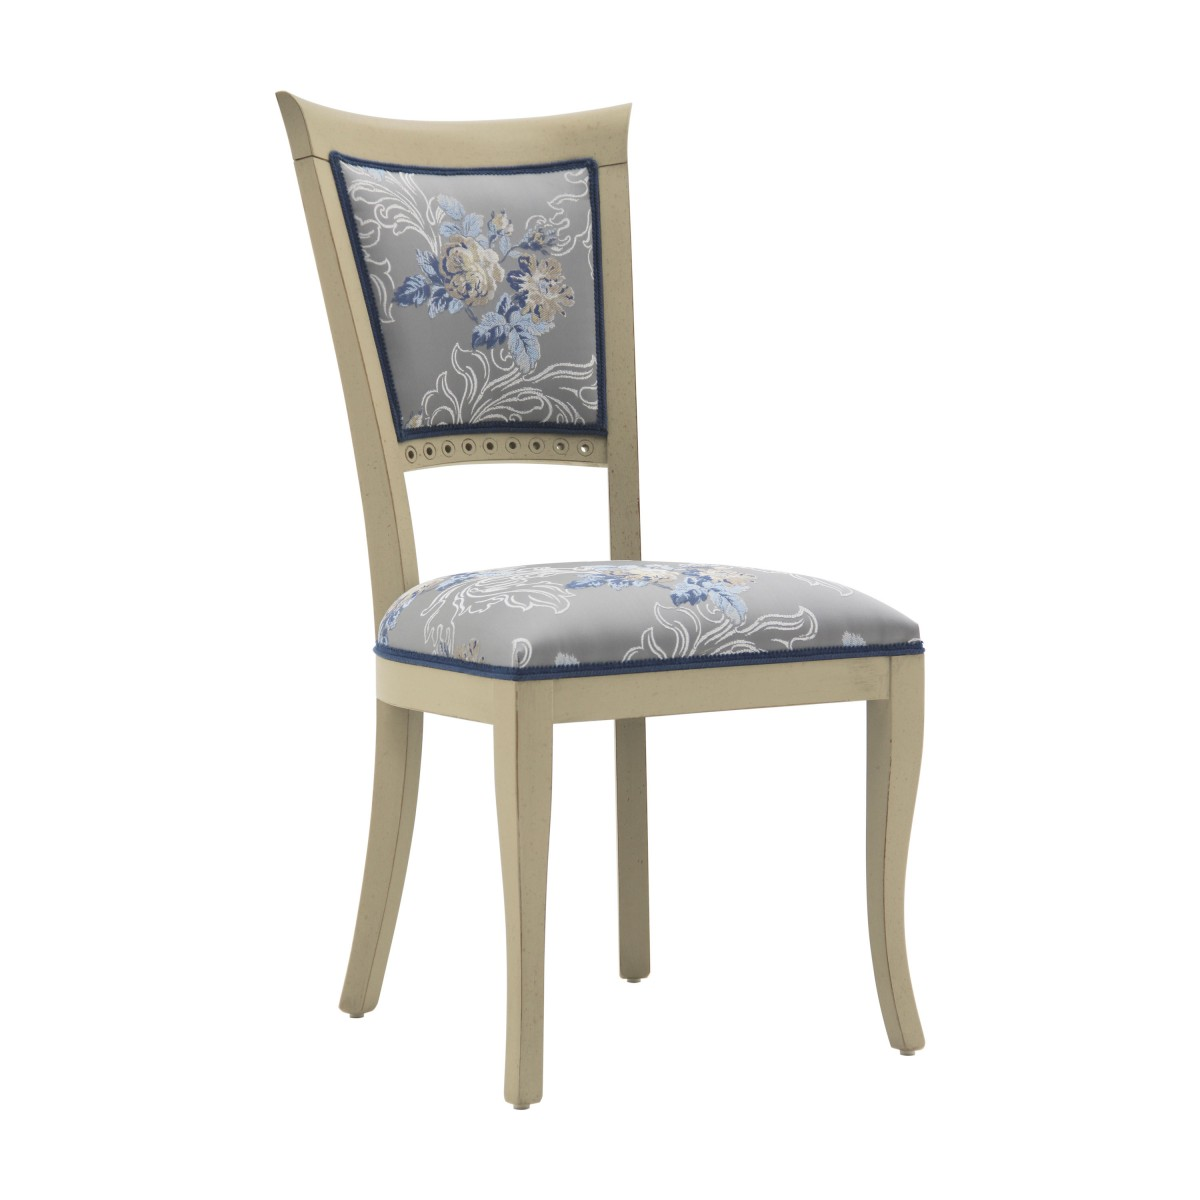 classic chair modigliani 9780